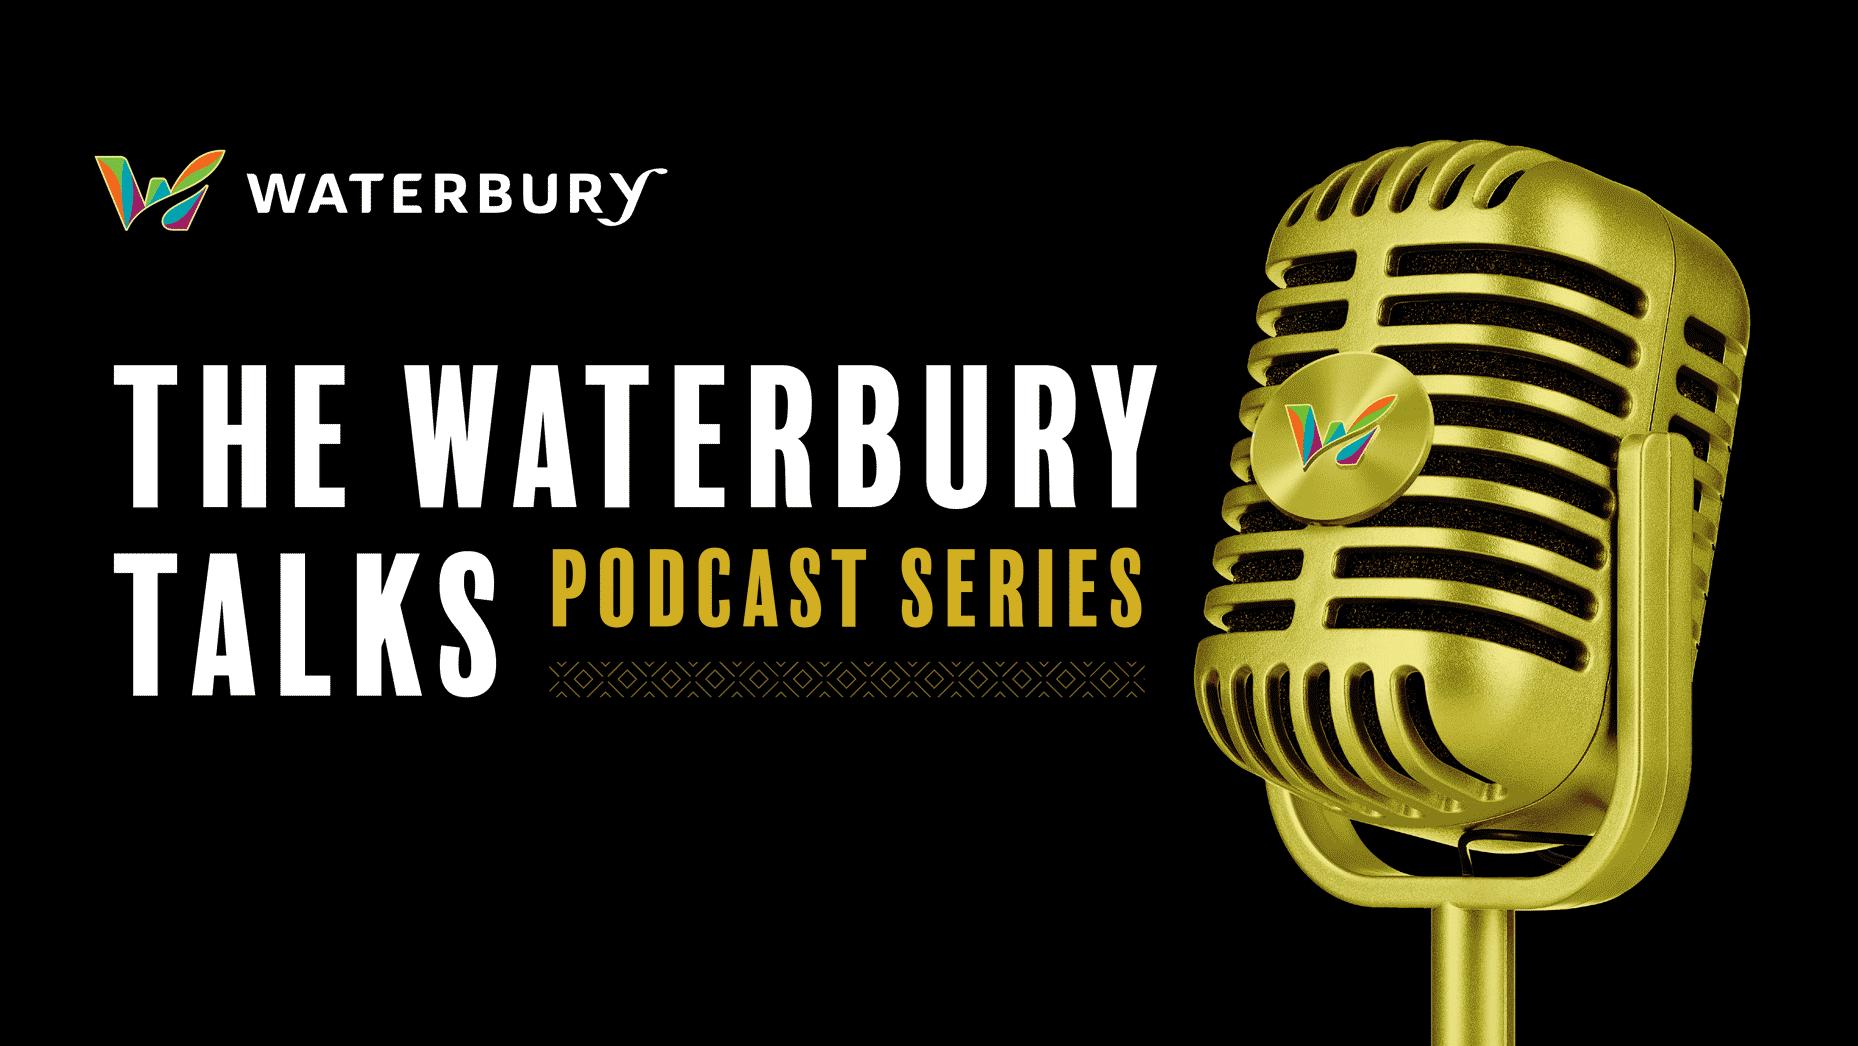 waterbury_ct_podcast_series_masthead.png